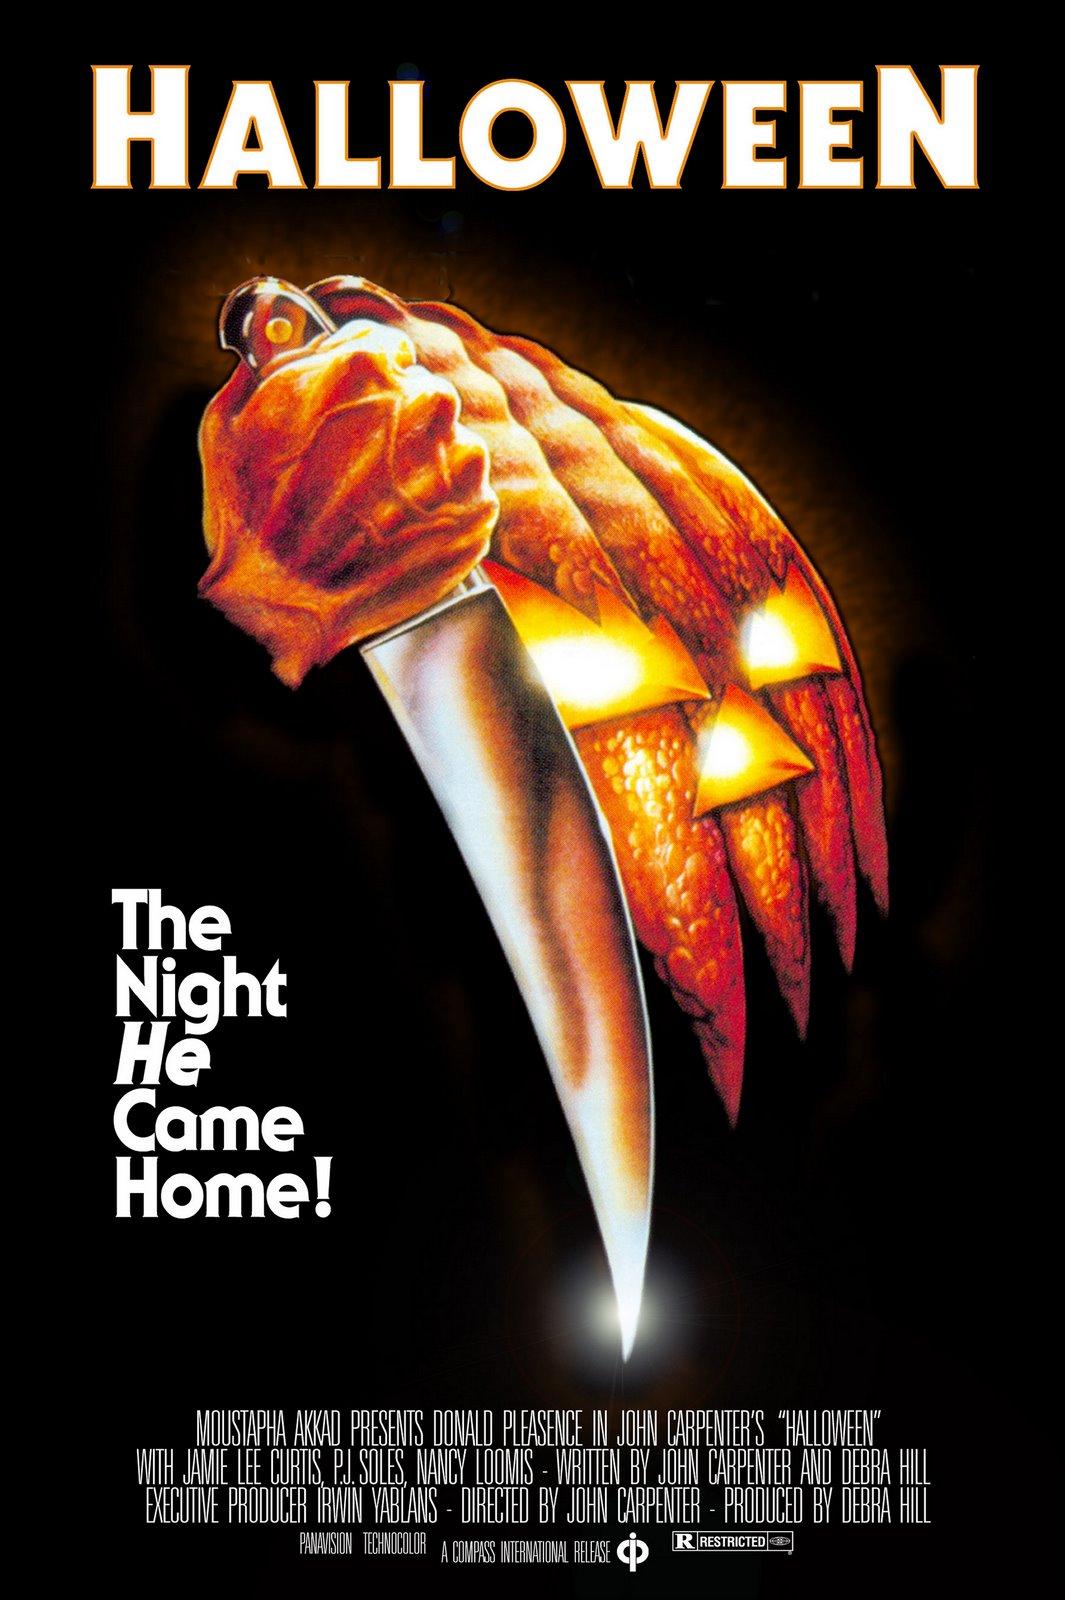 The good Halloween.